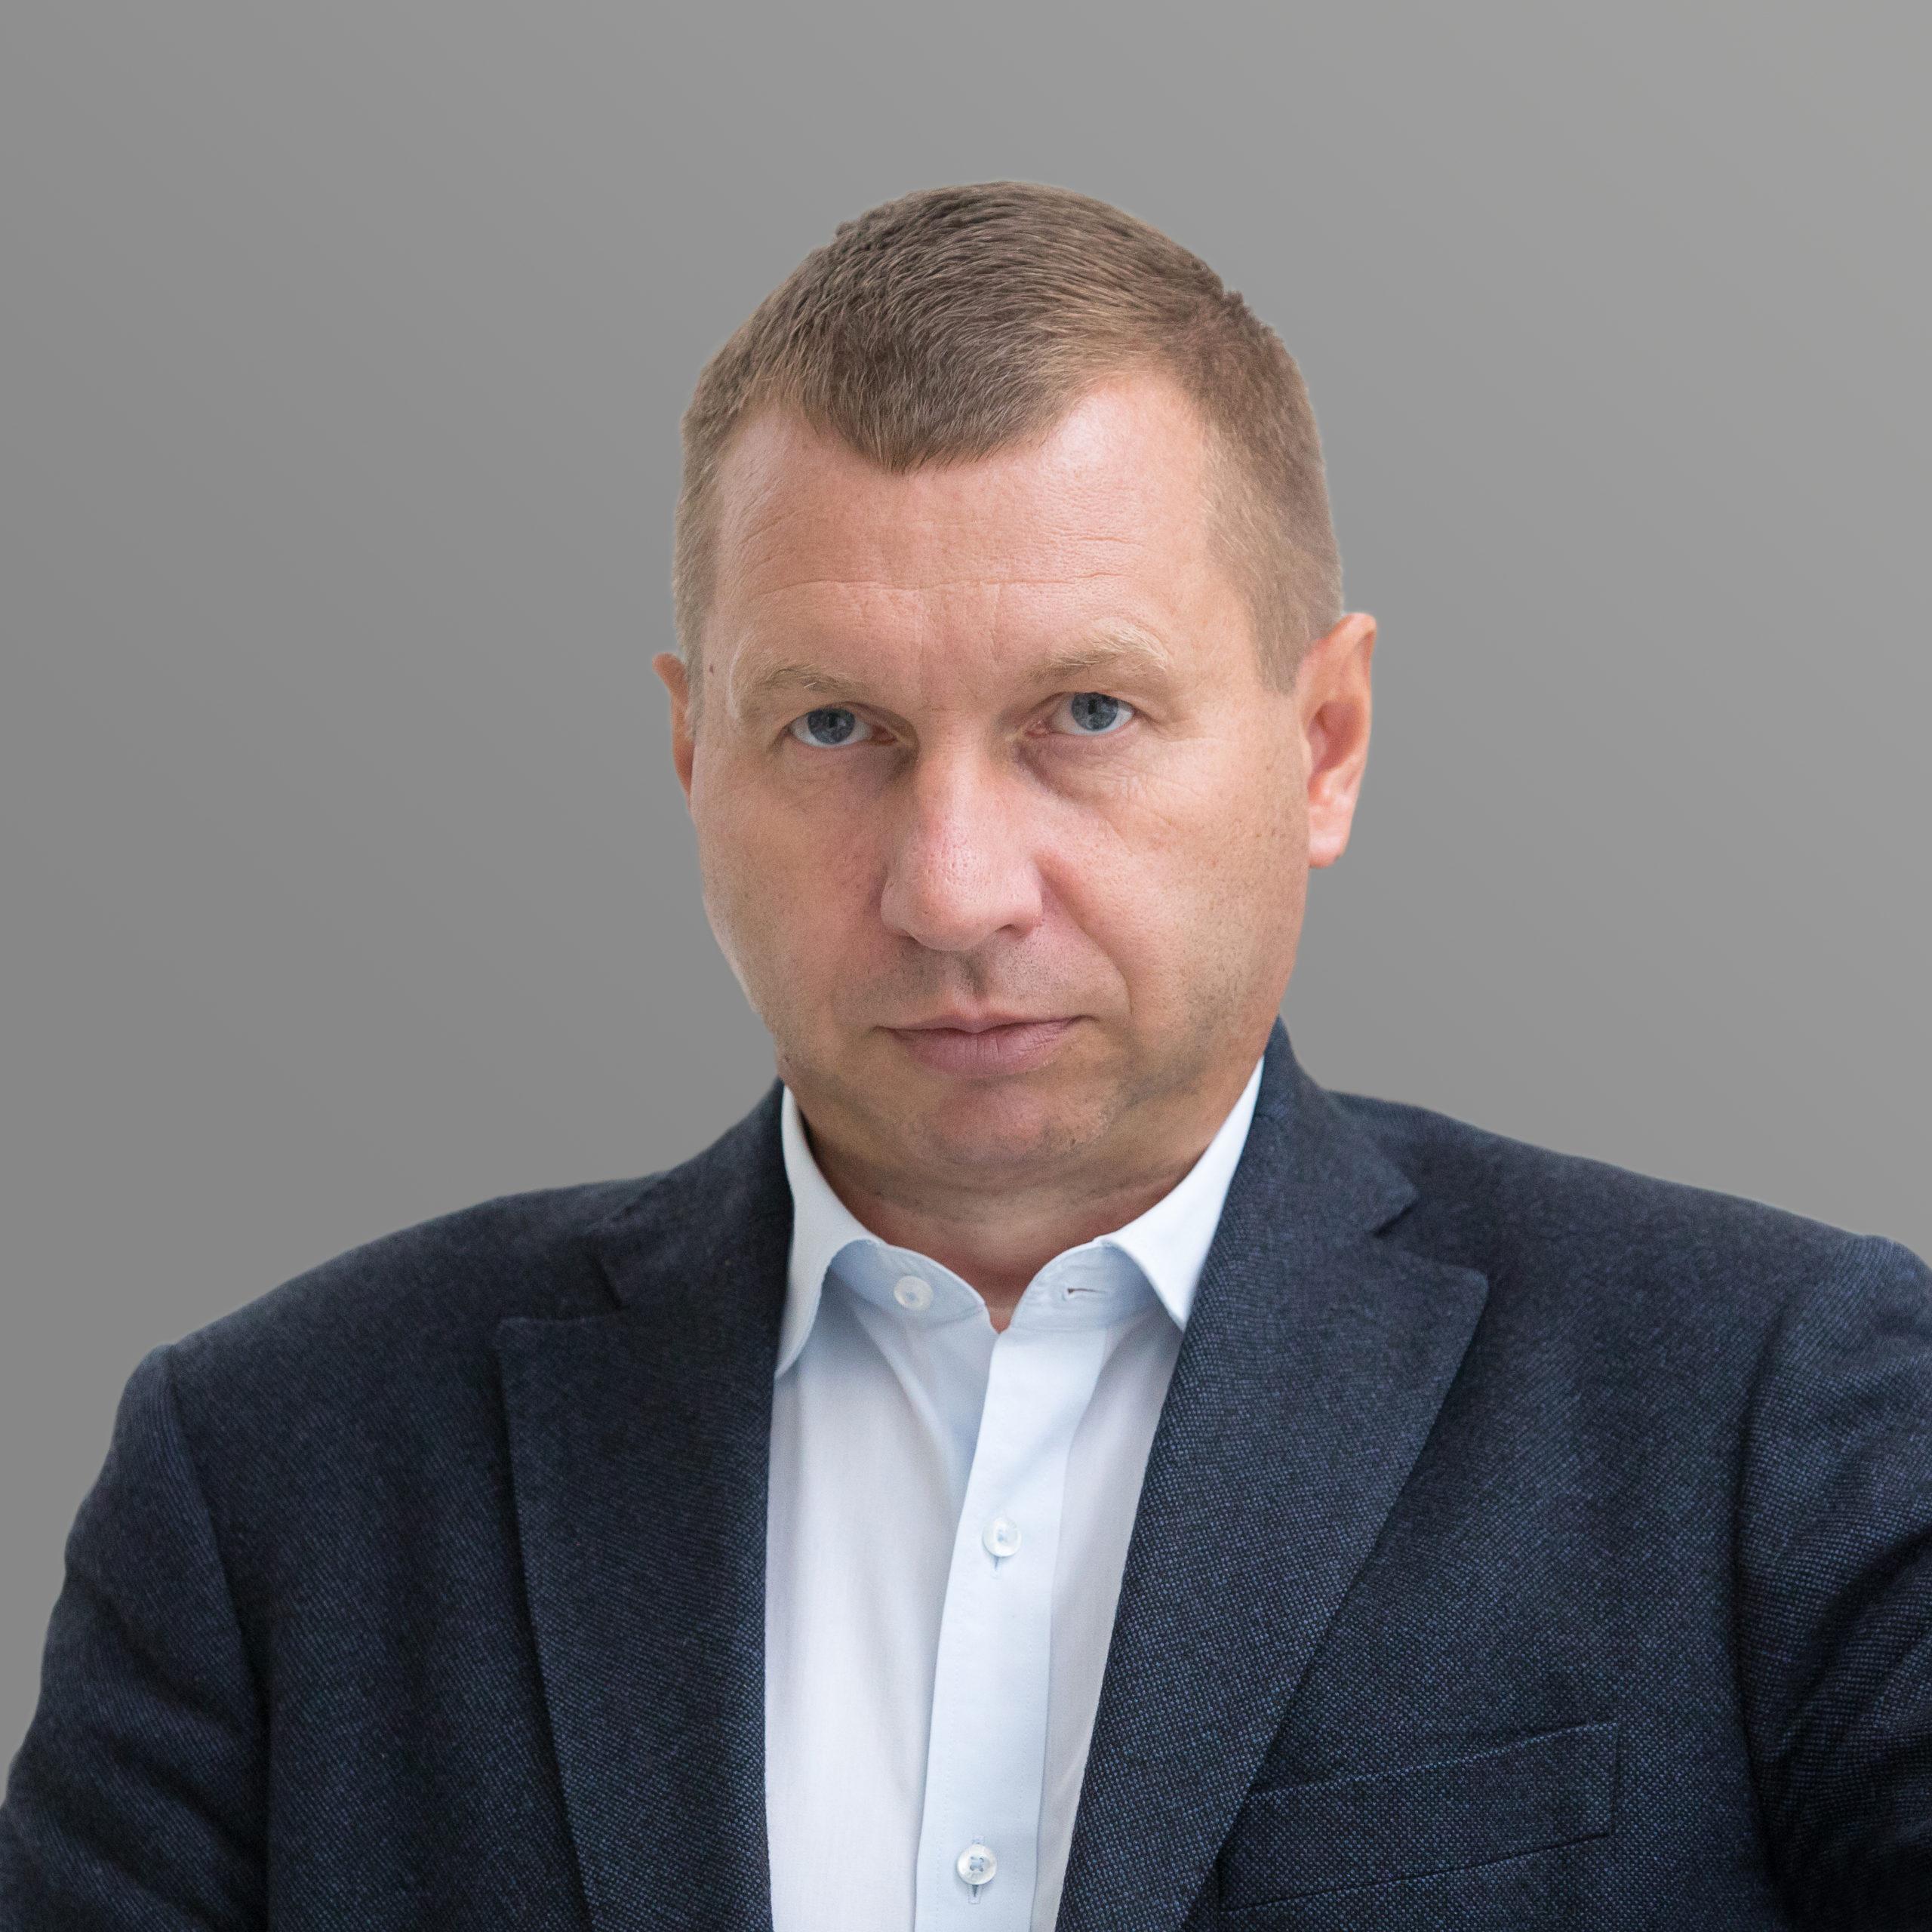 Пашенцев Дмитрий Алексеевич